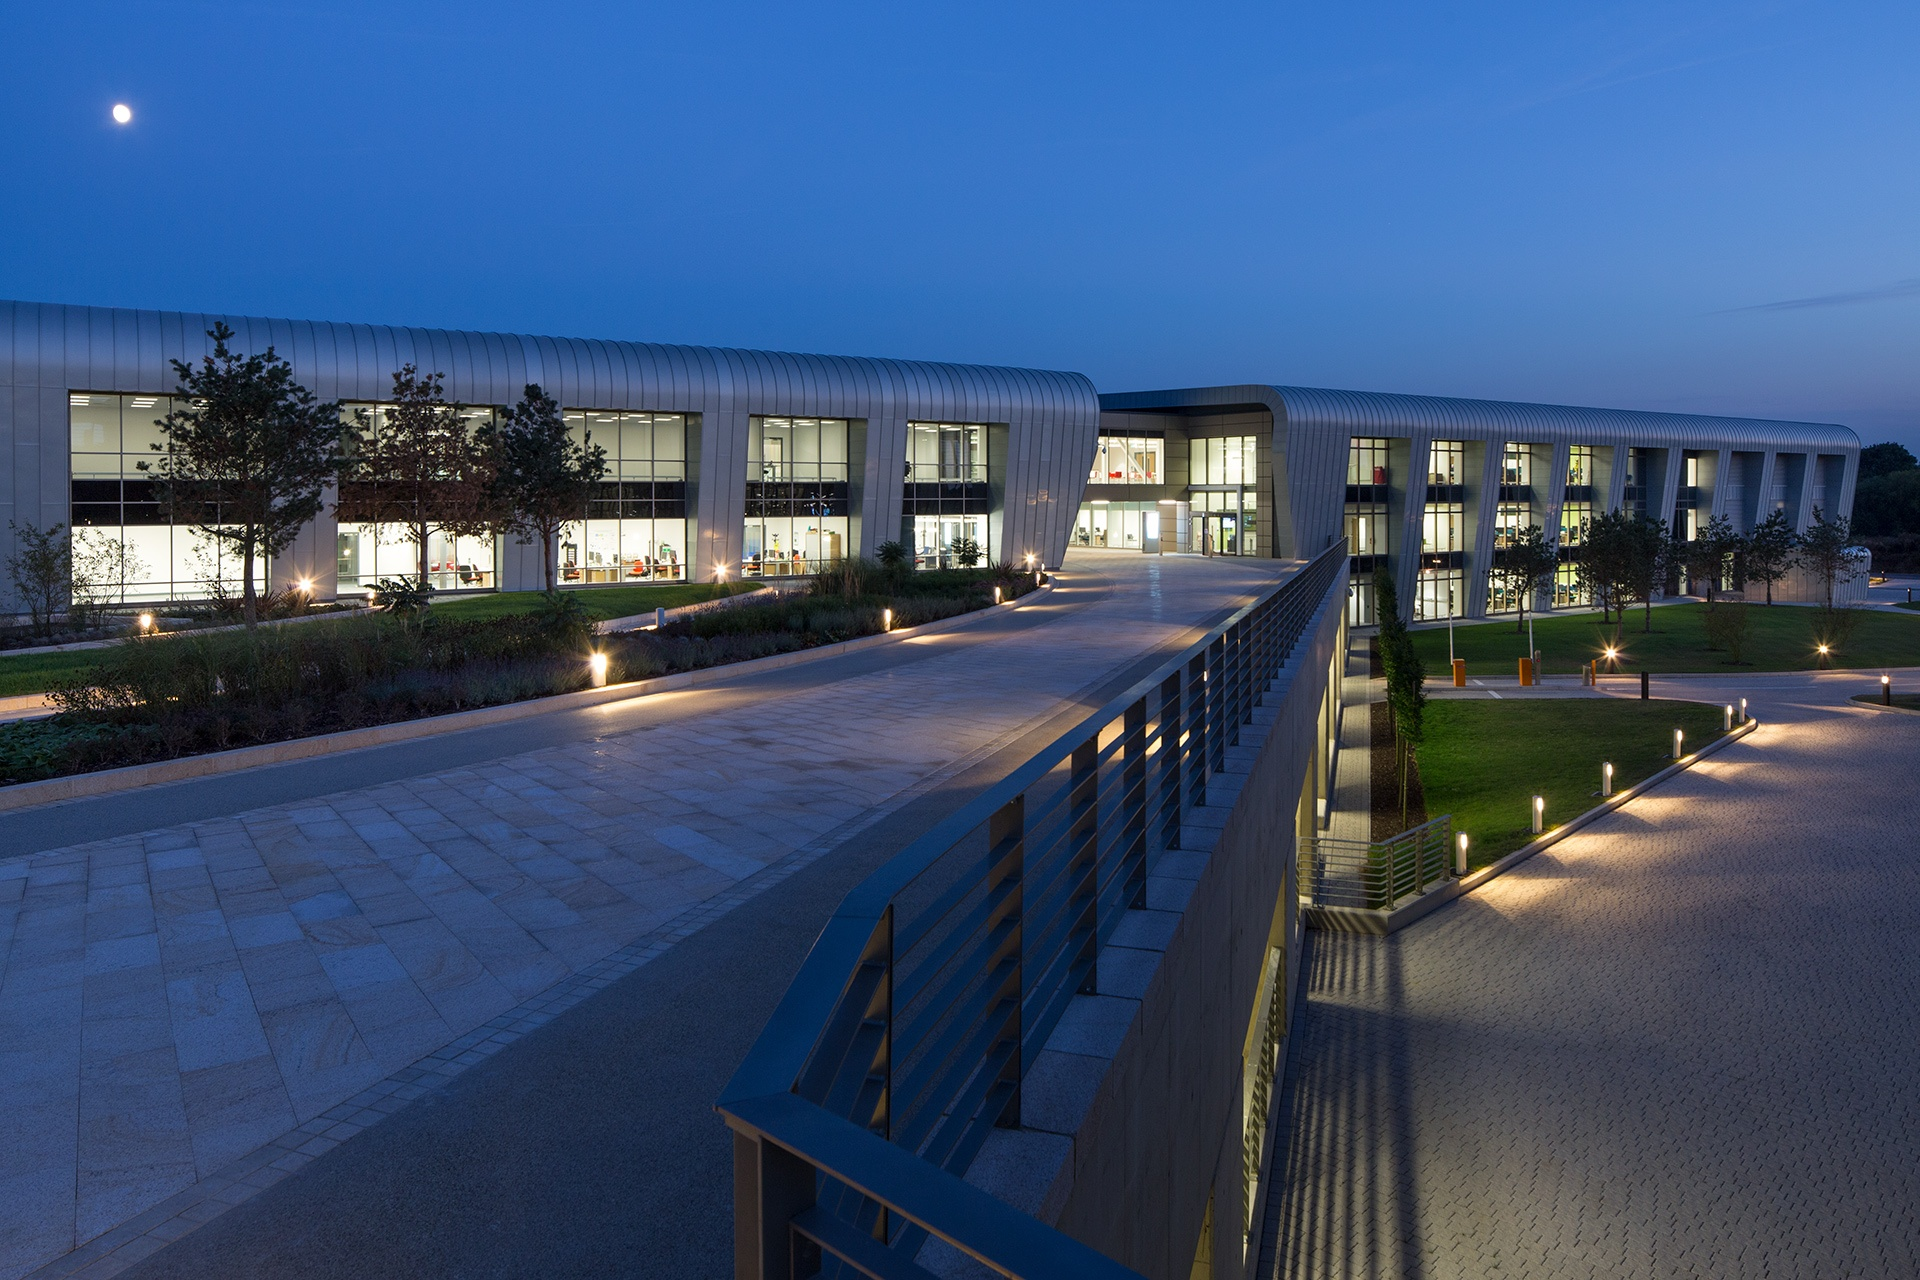 BioData Innovation Centre